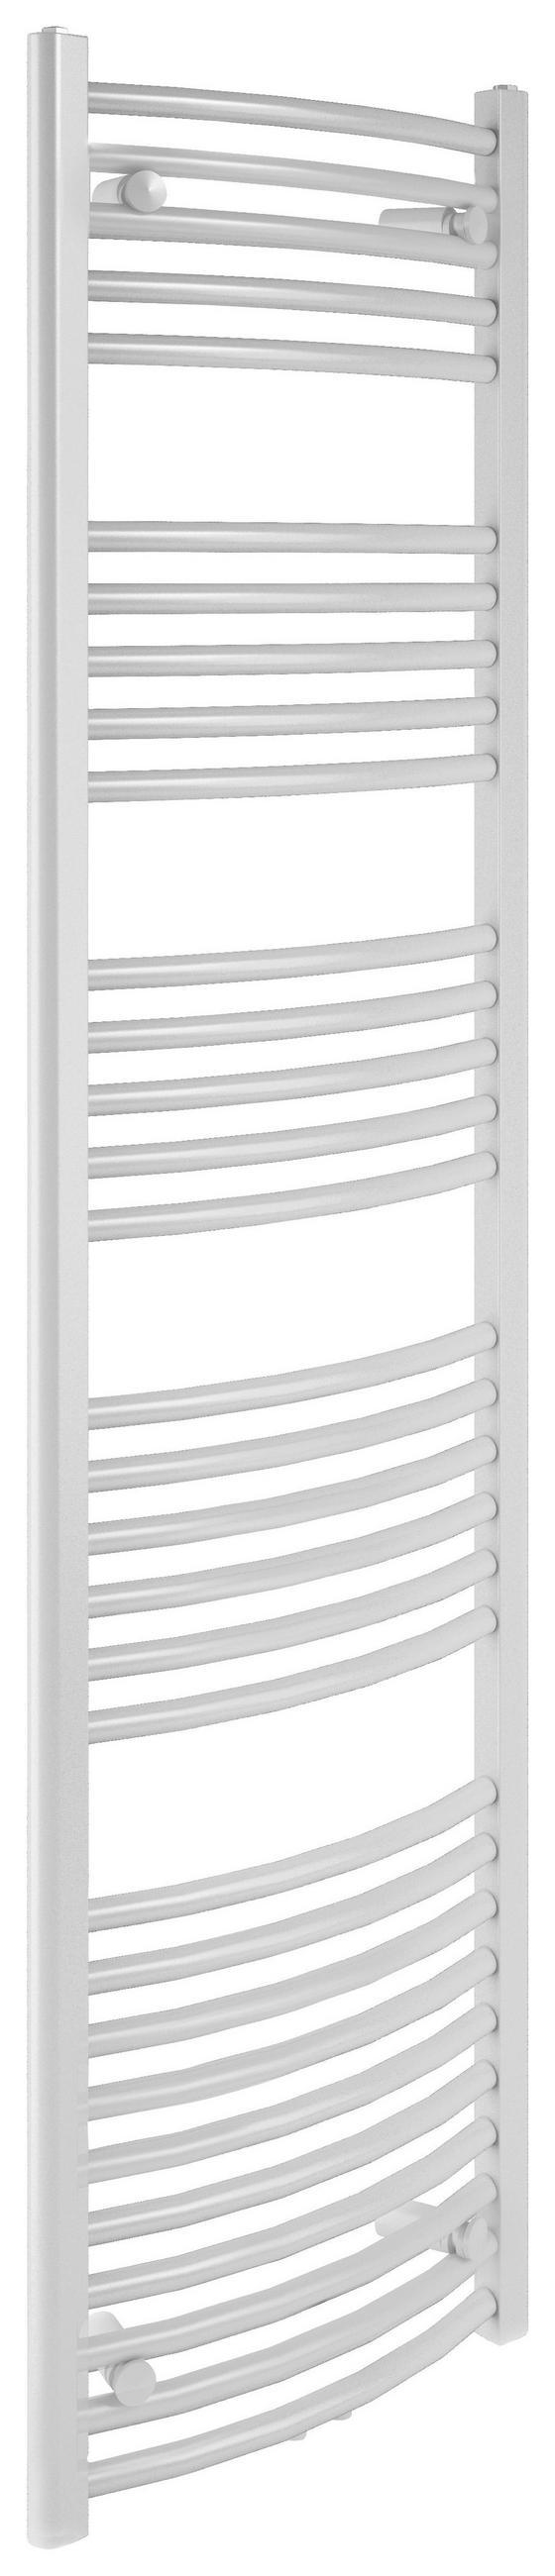 Badheizkörper Bari Gebogen,600x1785 mm - Weiß, Metall (60/178,5/12cm)